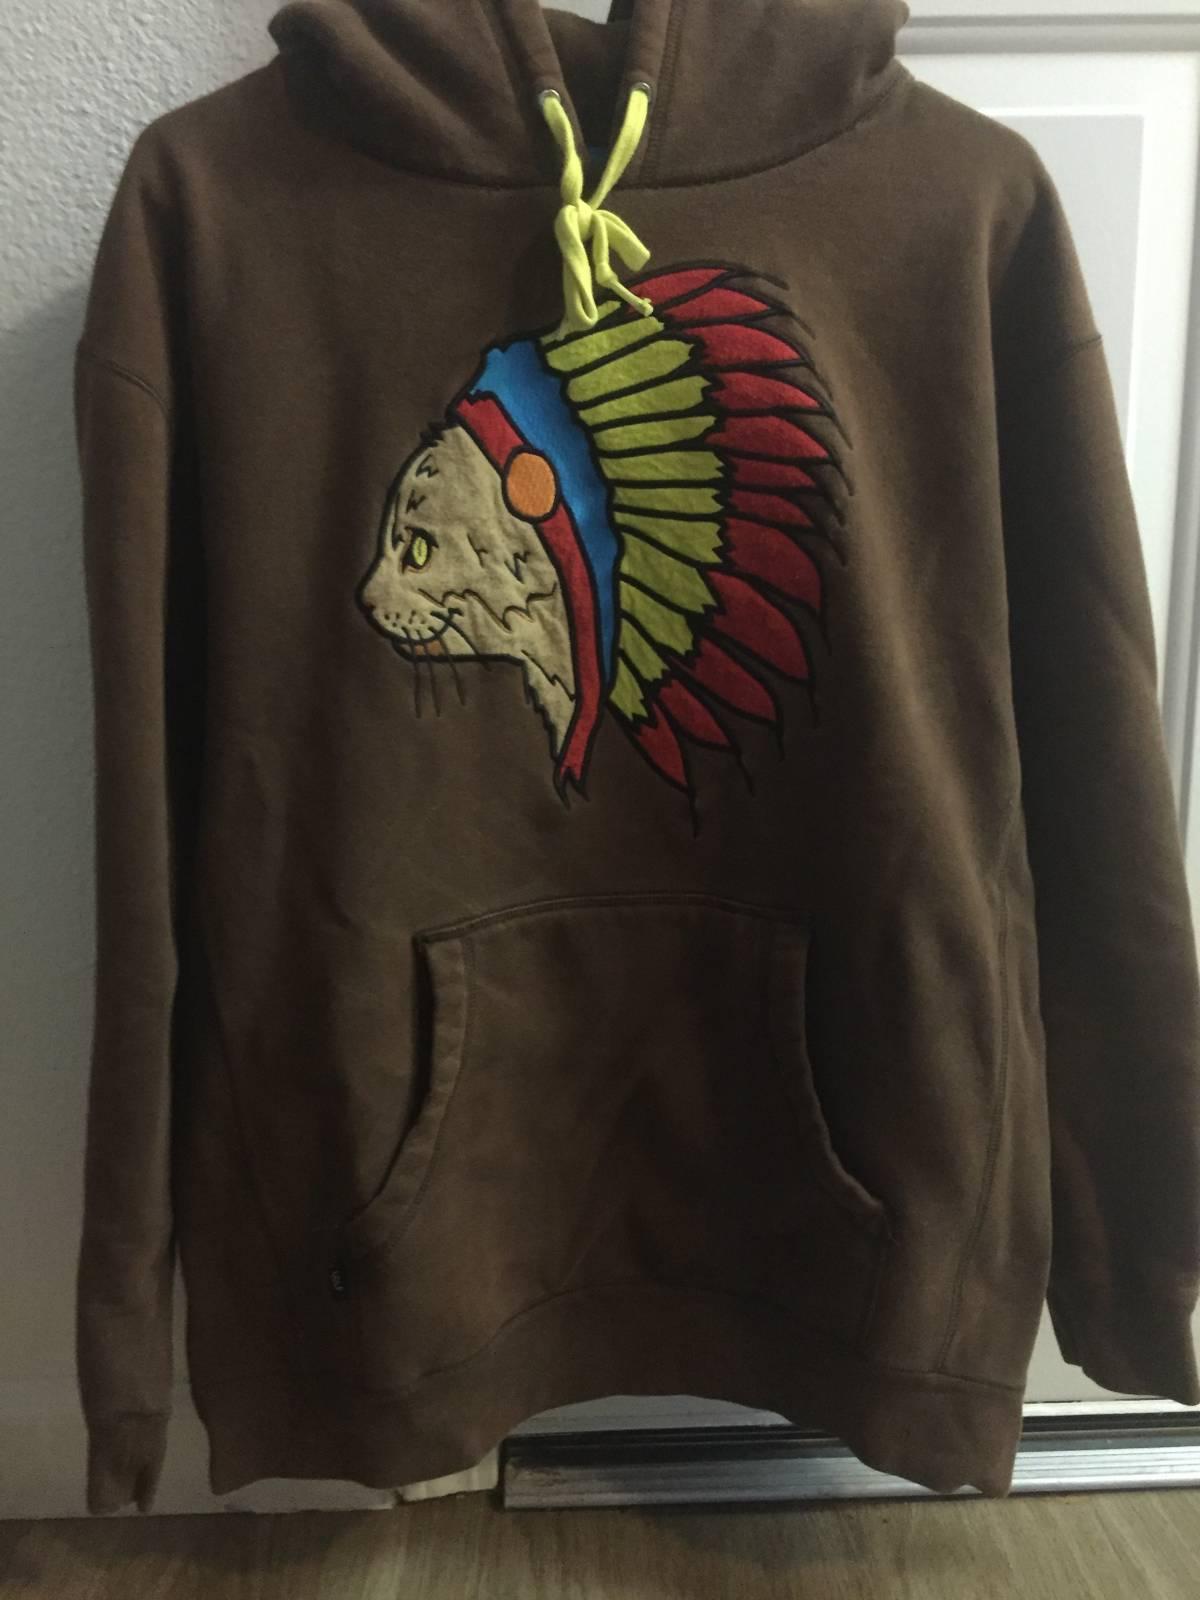 56a9e56a59ec Golf Wang Golf Wang Native Cat Hoodie Size l - Sweatshirts   Hoodies for  Sale - Grailed